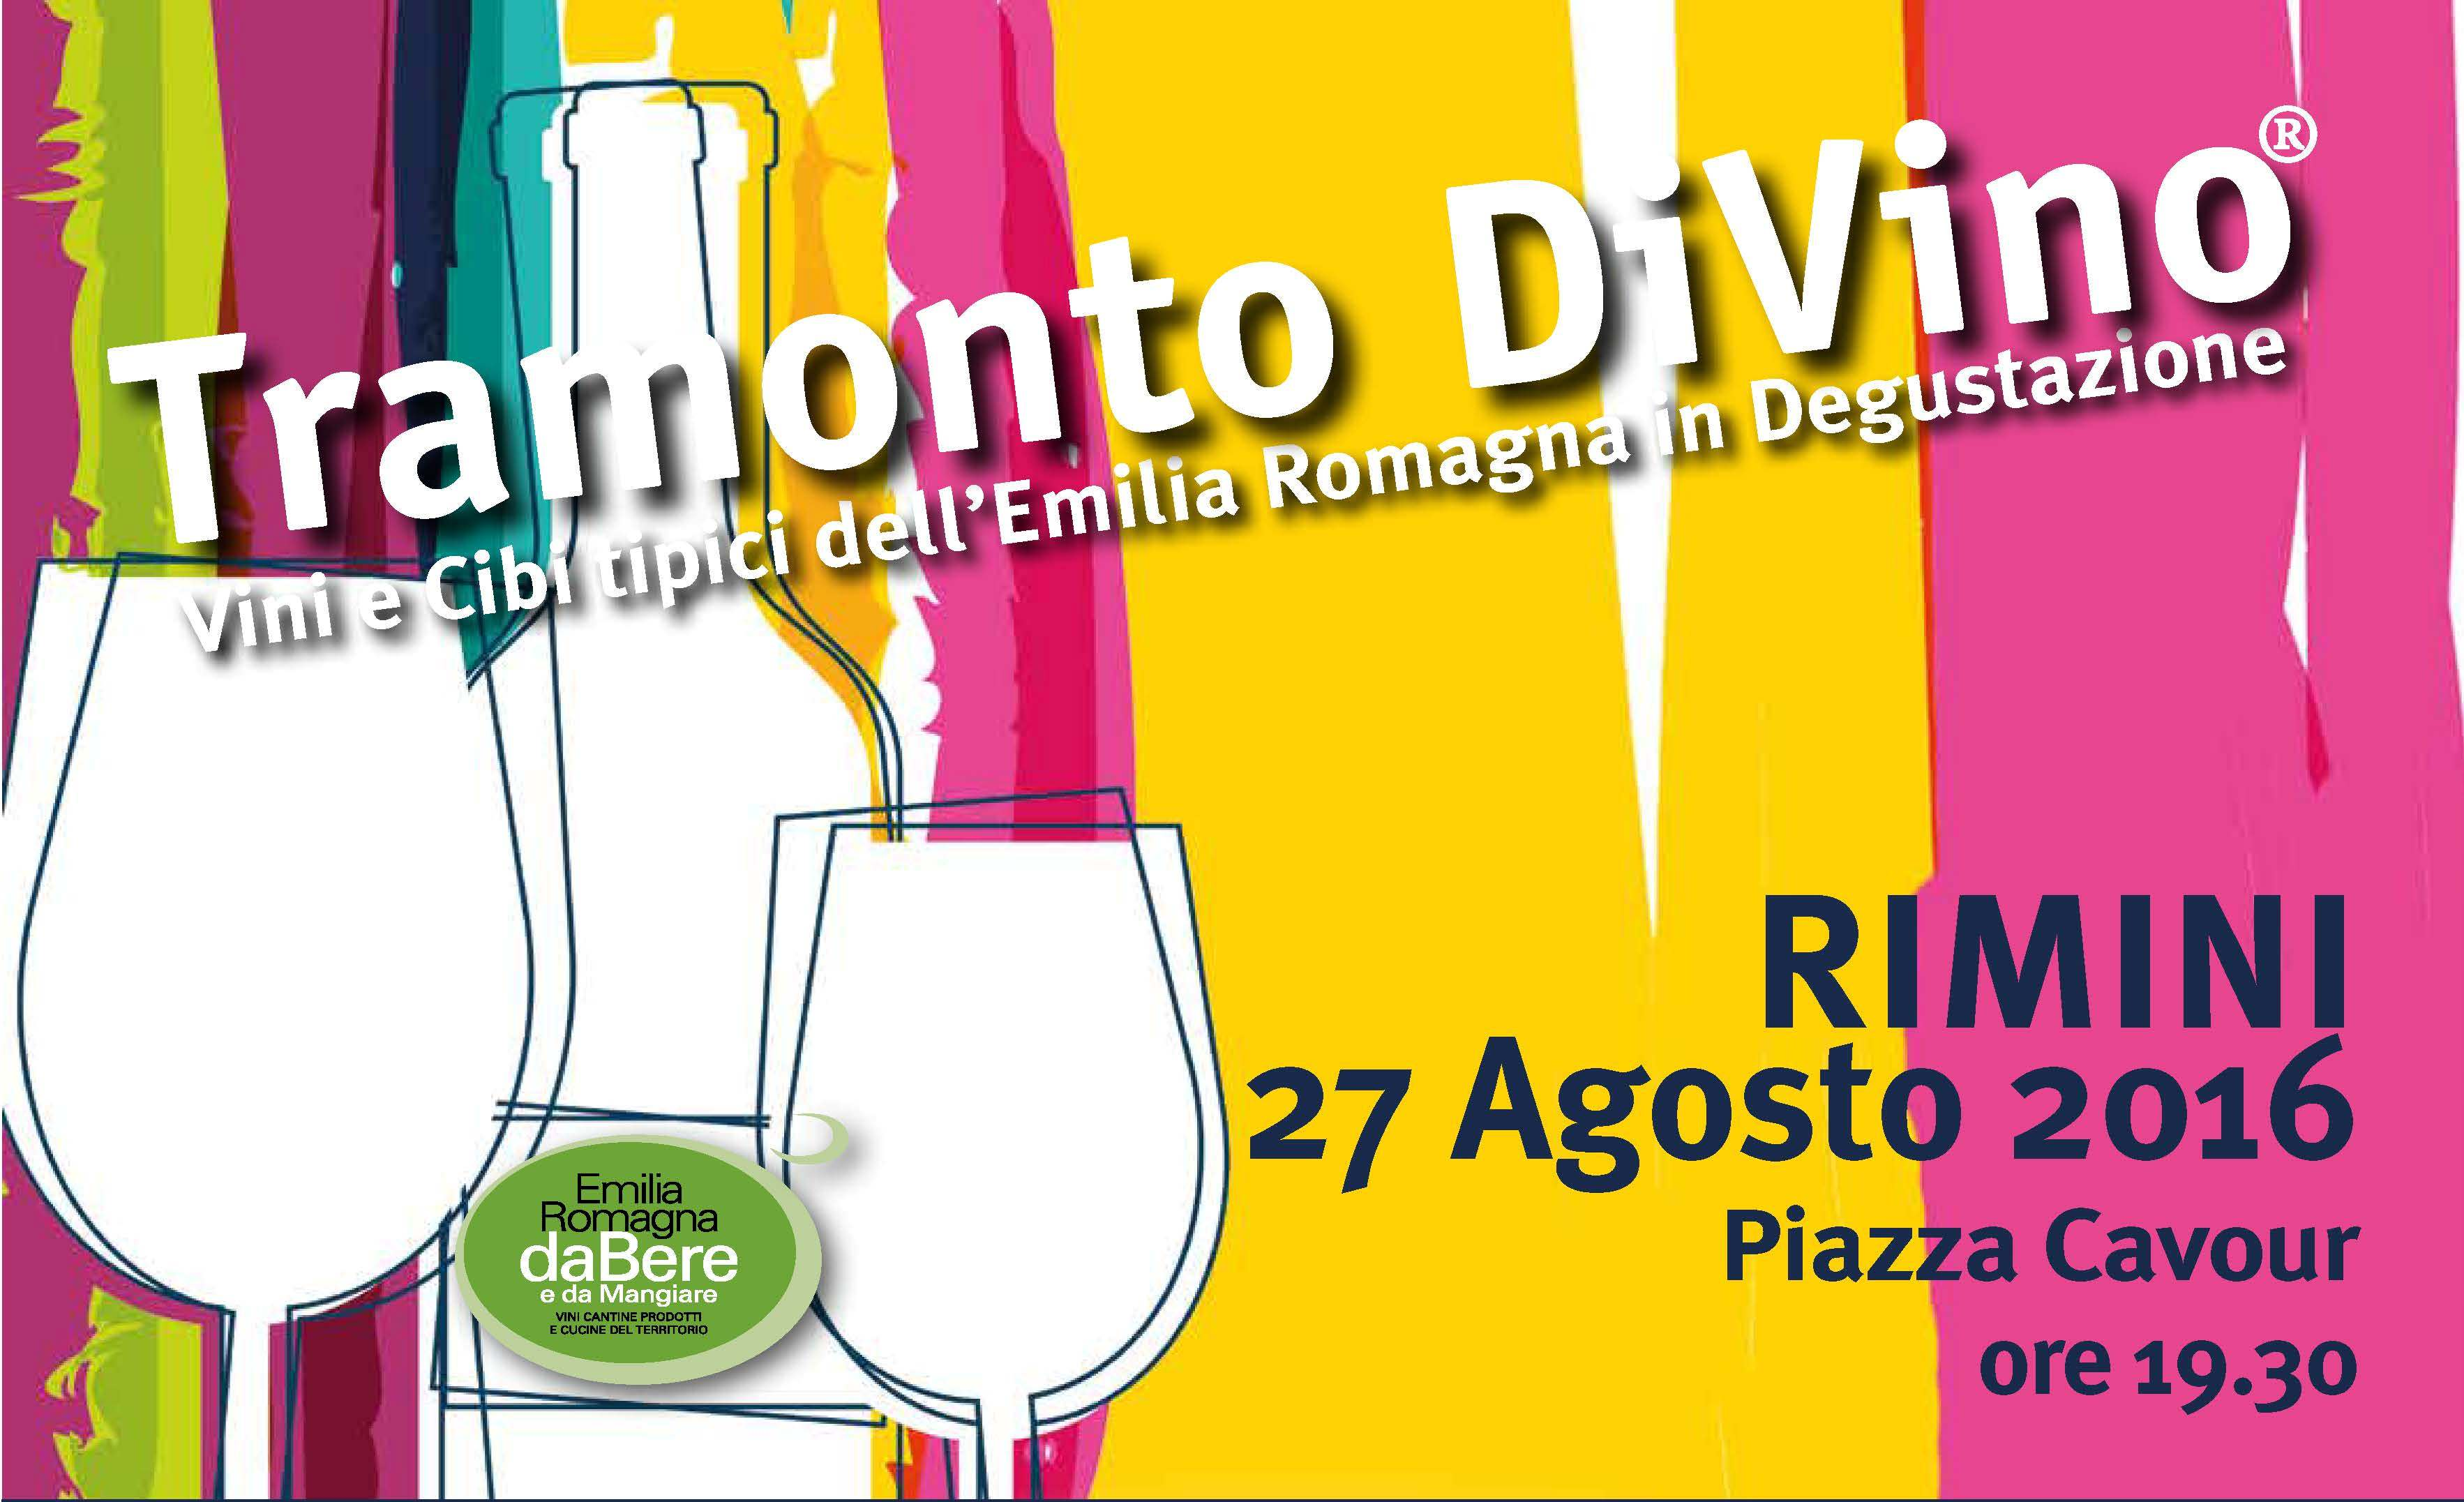 Tramonto DiVino 2016